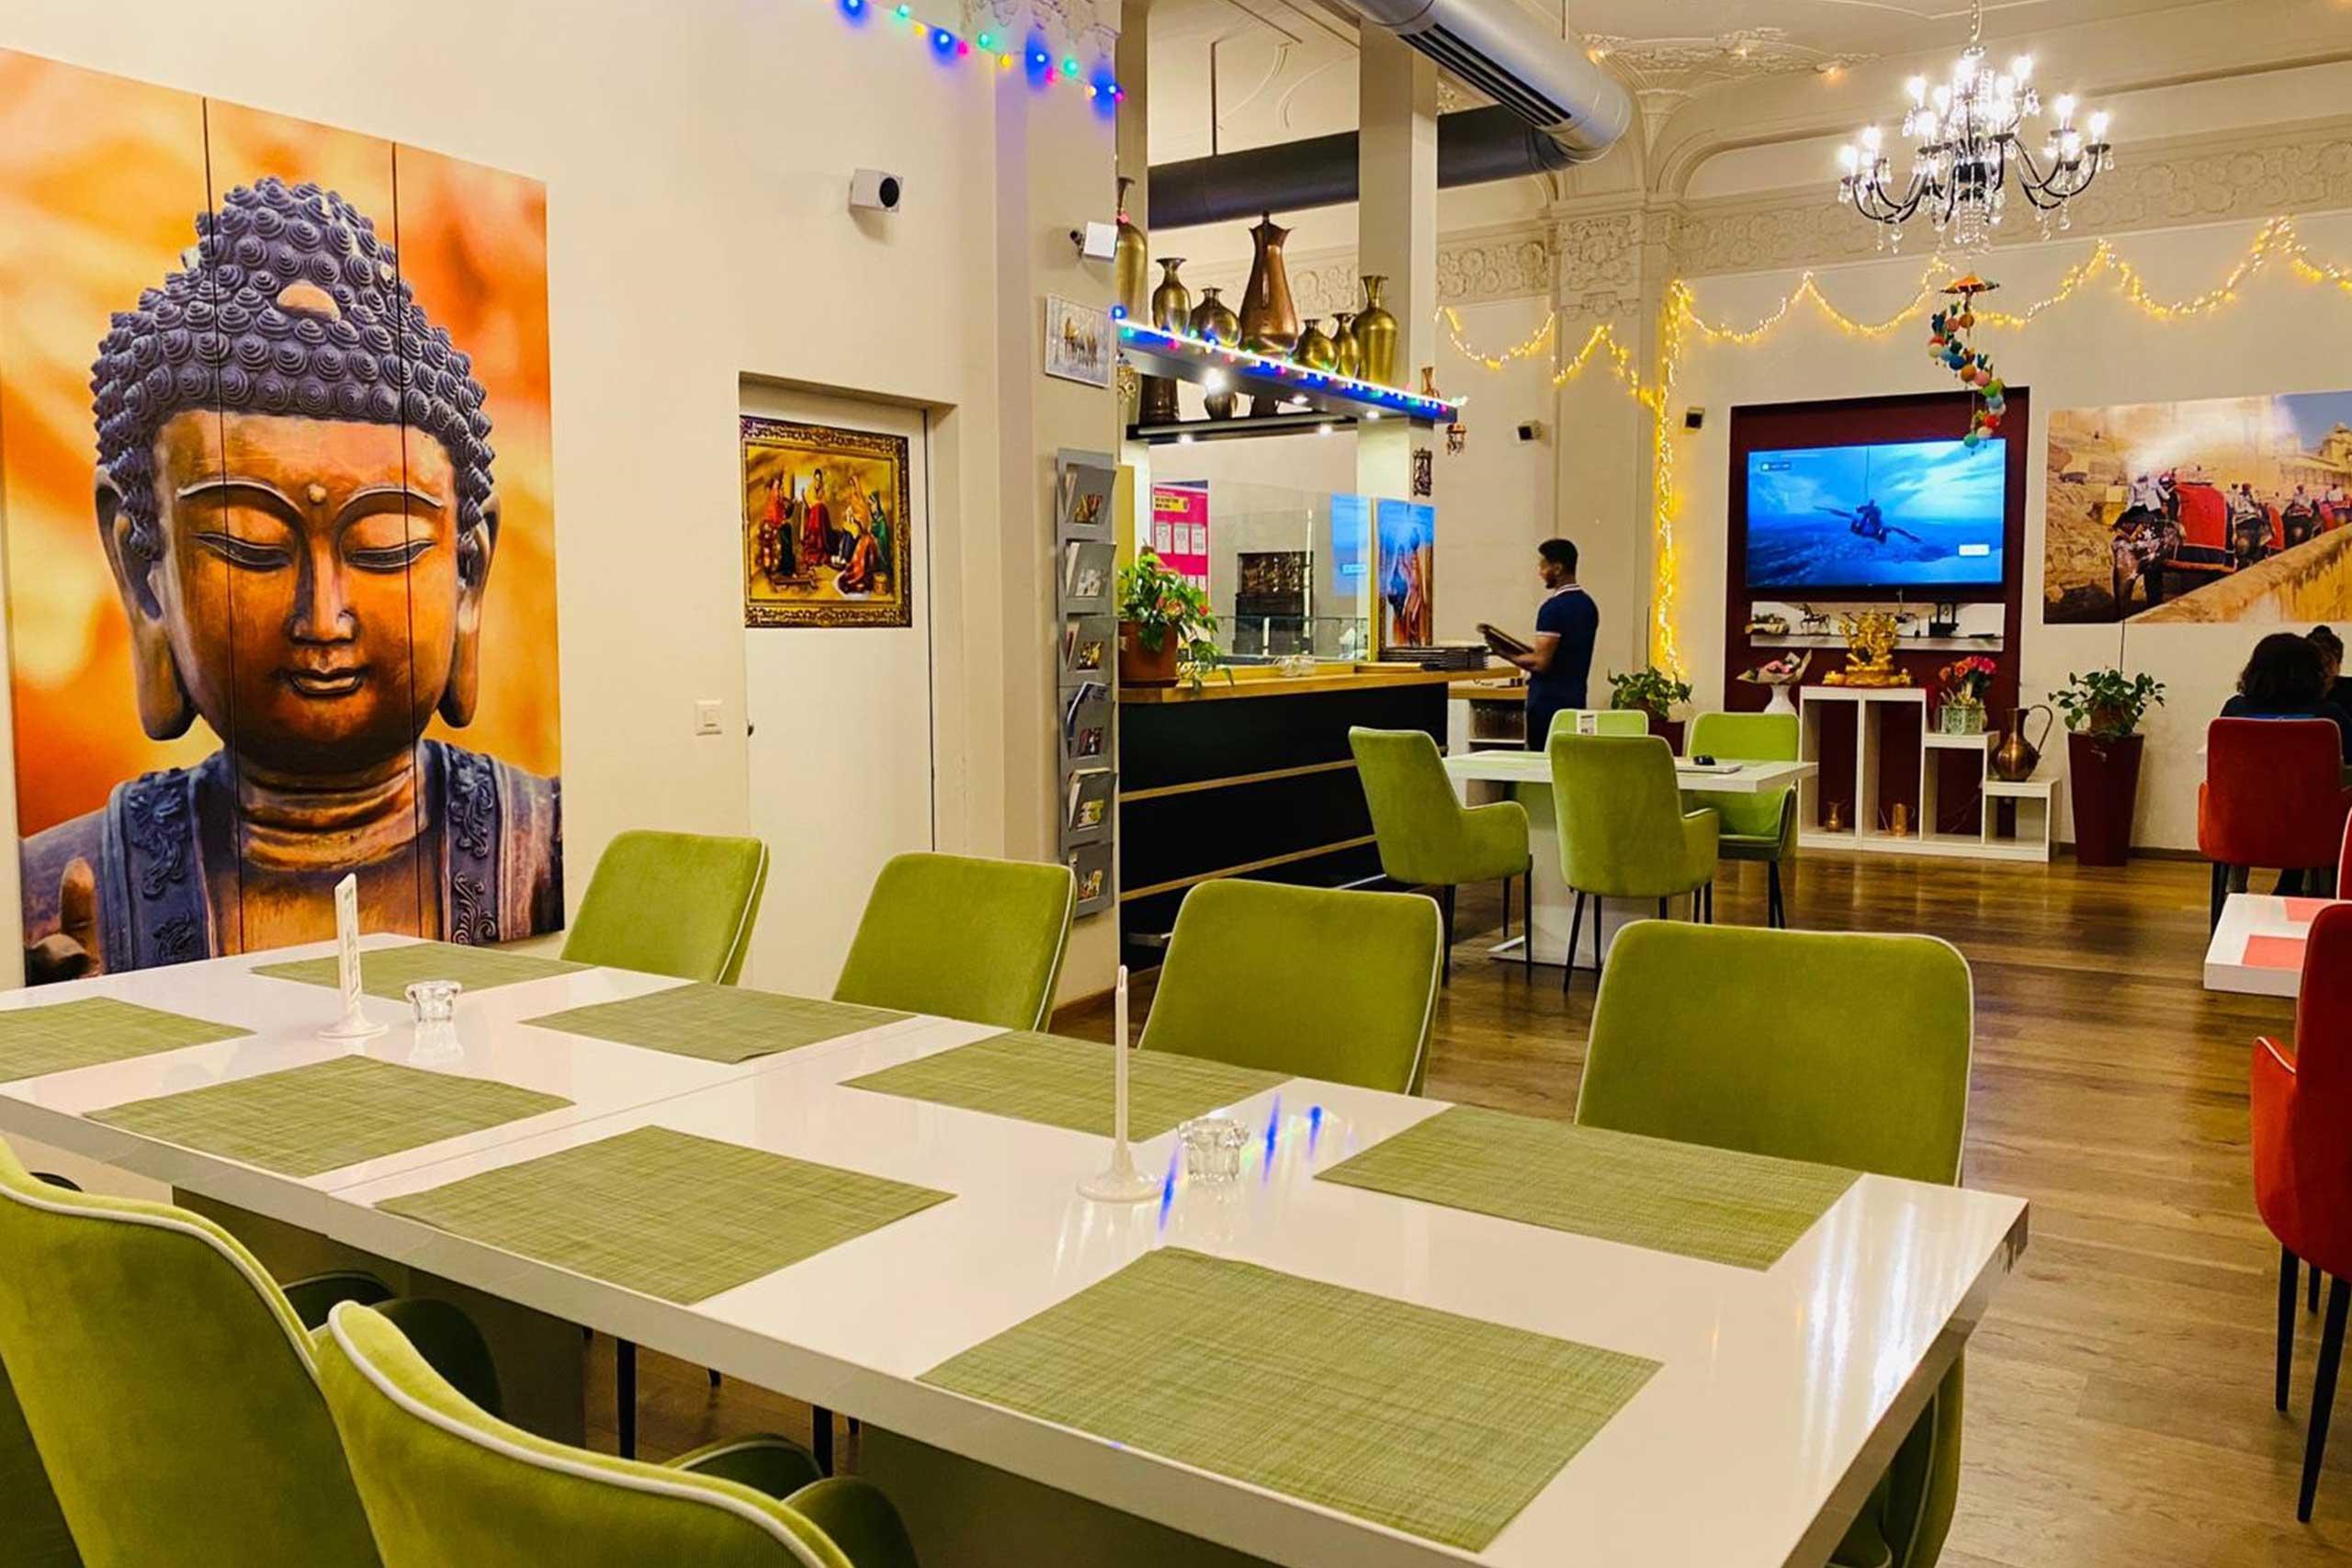 delh-darbar-indian-restaurant-speisesaal-2.jpg